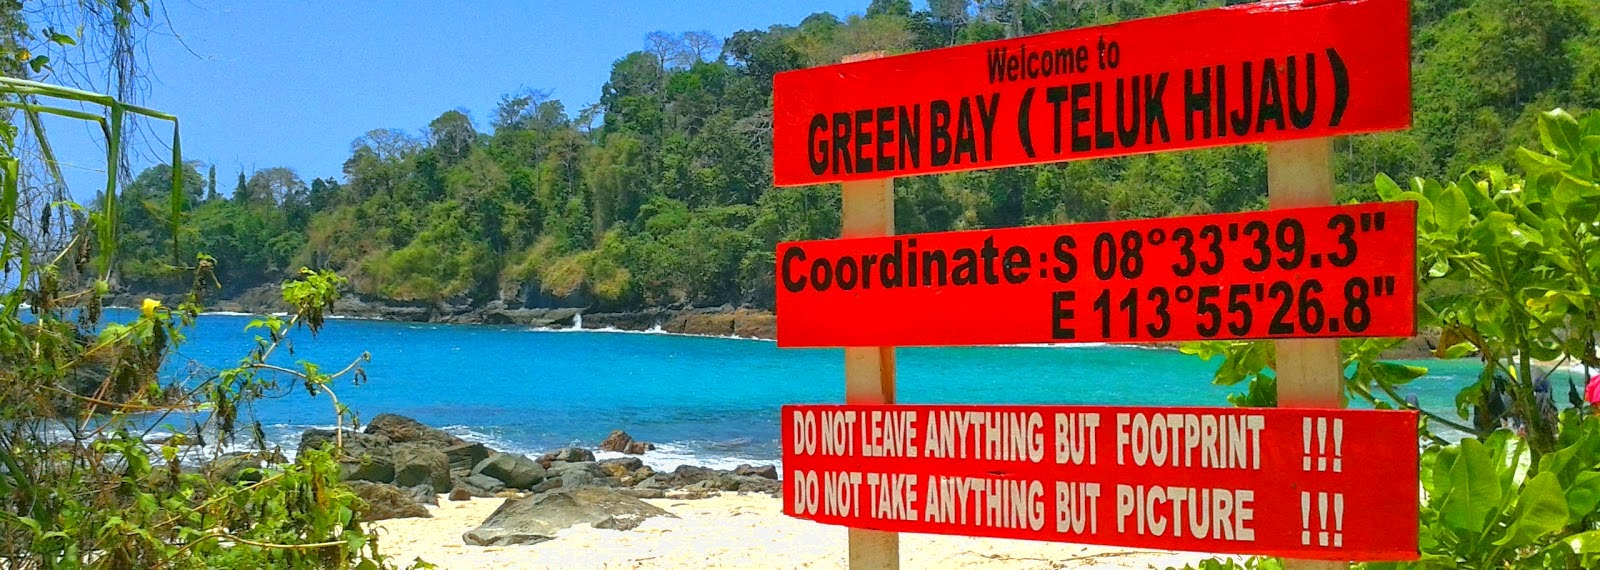 Pantai Teluk Hijau Surga Tersembunyi Banyuwangi Menemukan Papan Berarti Berada